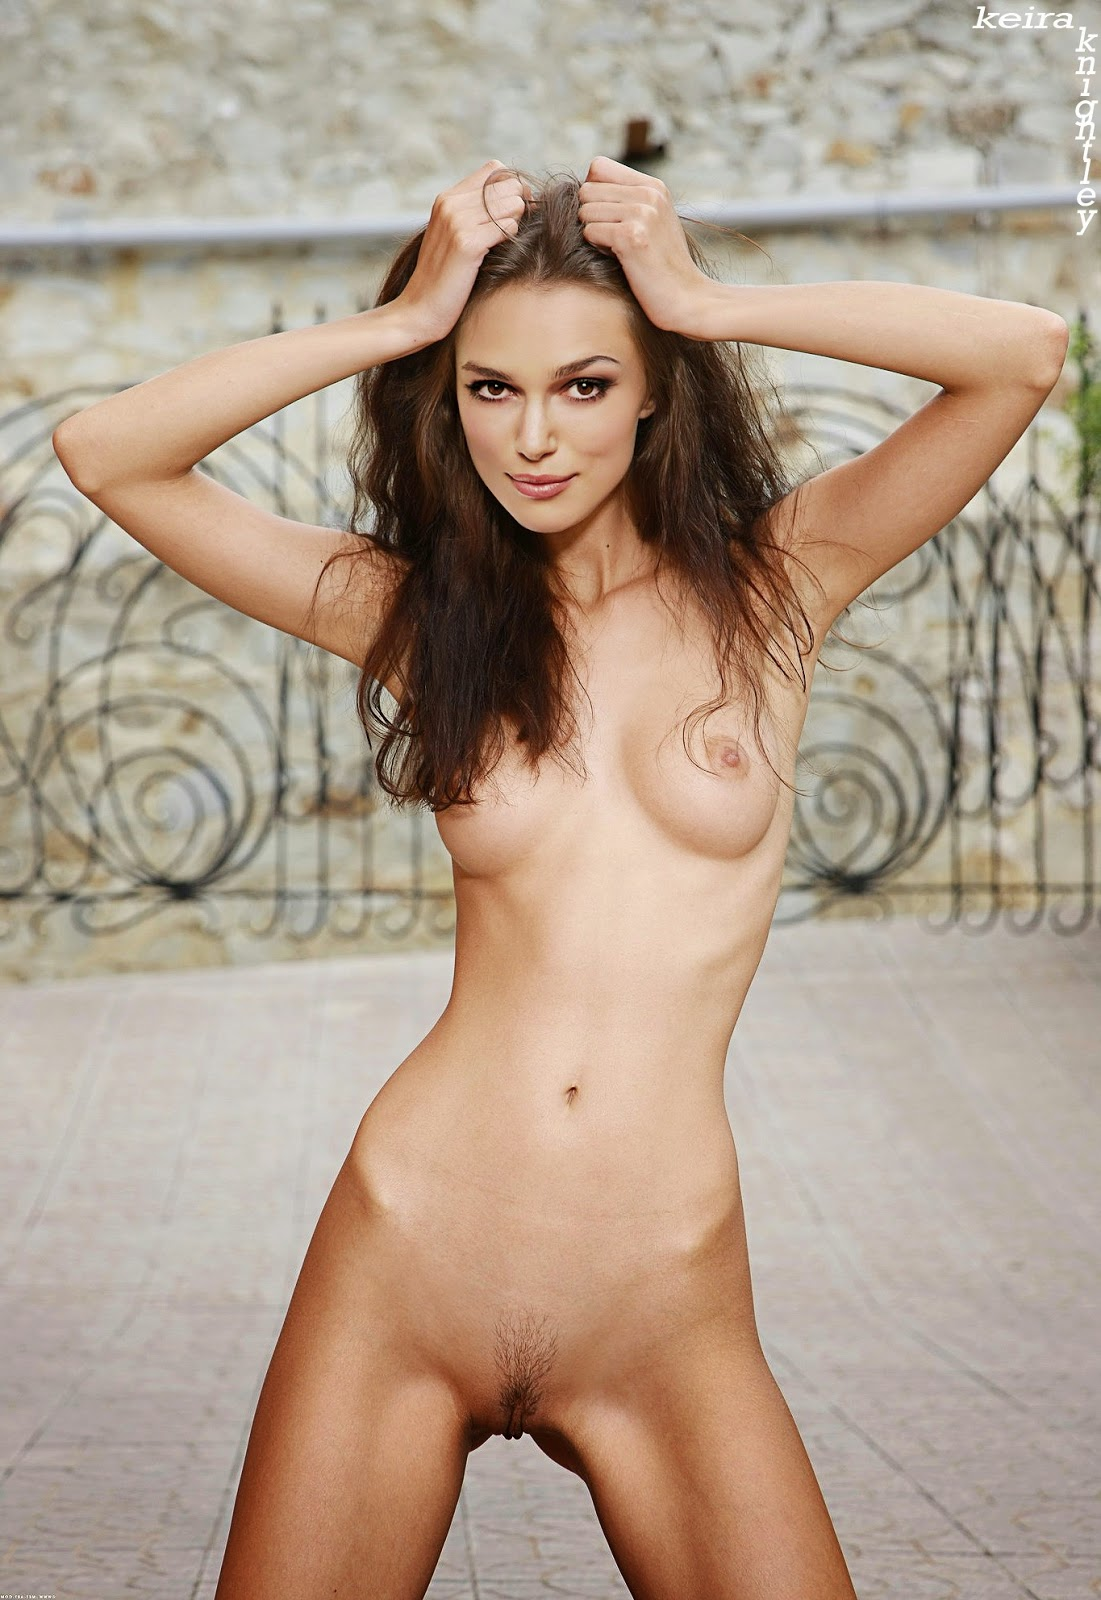 Keira knightley nudes xnxx #15